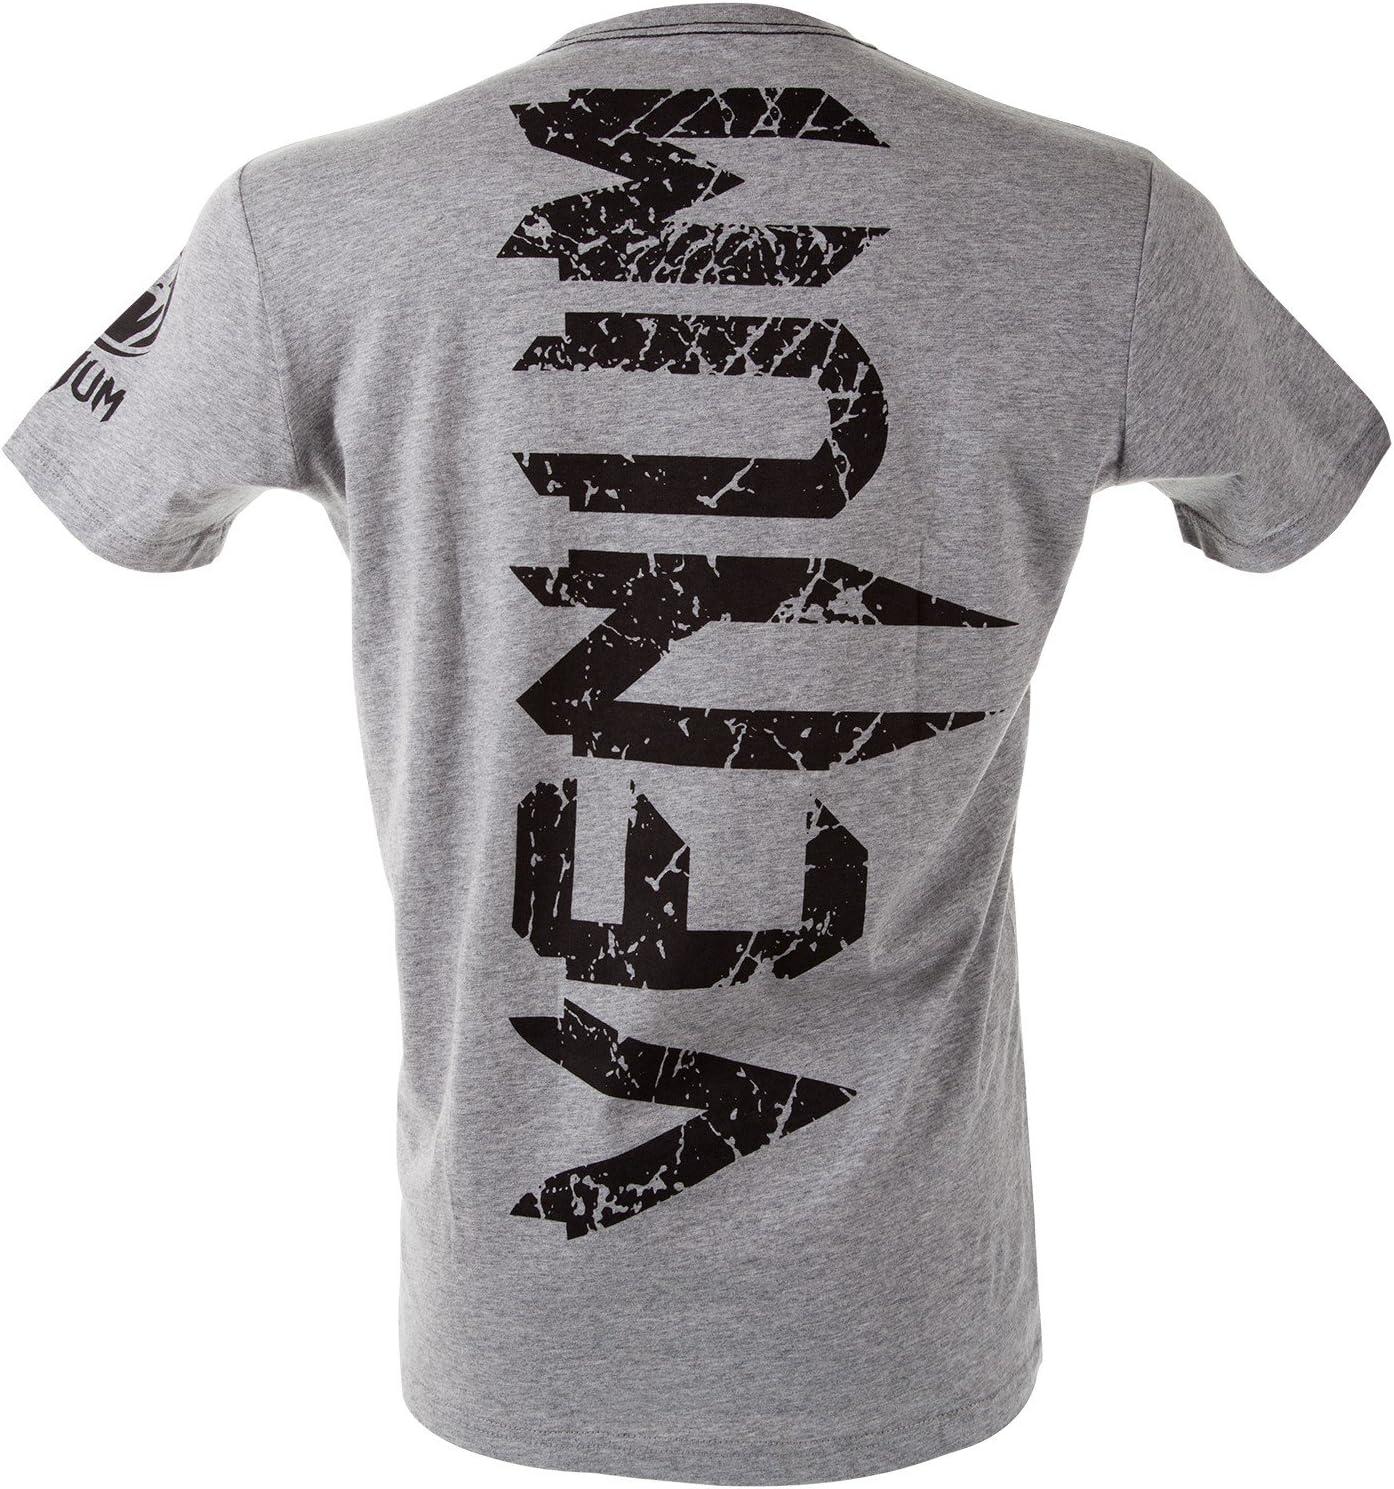 Venum Giant Mens T Shirt